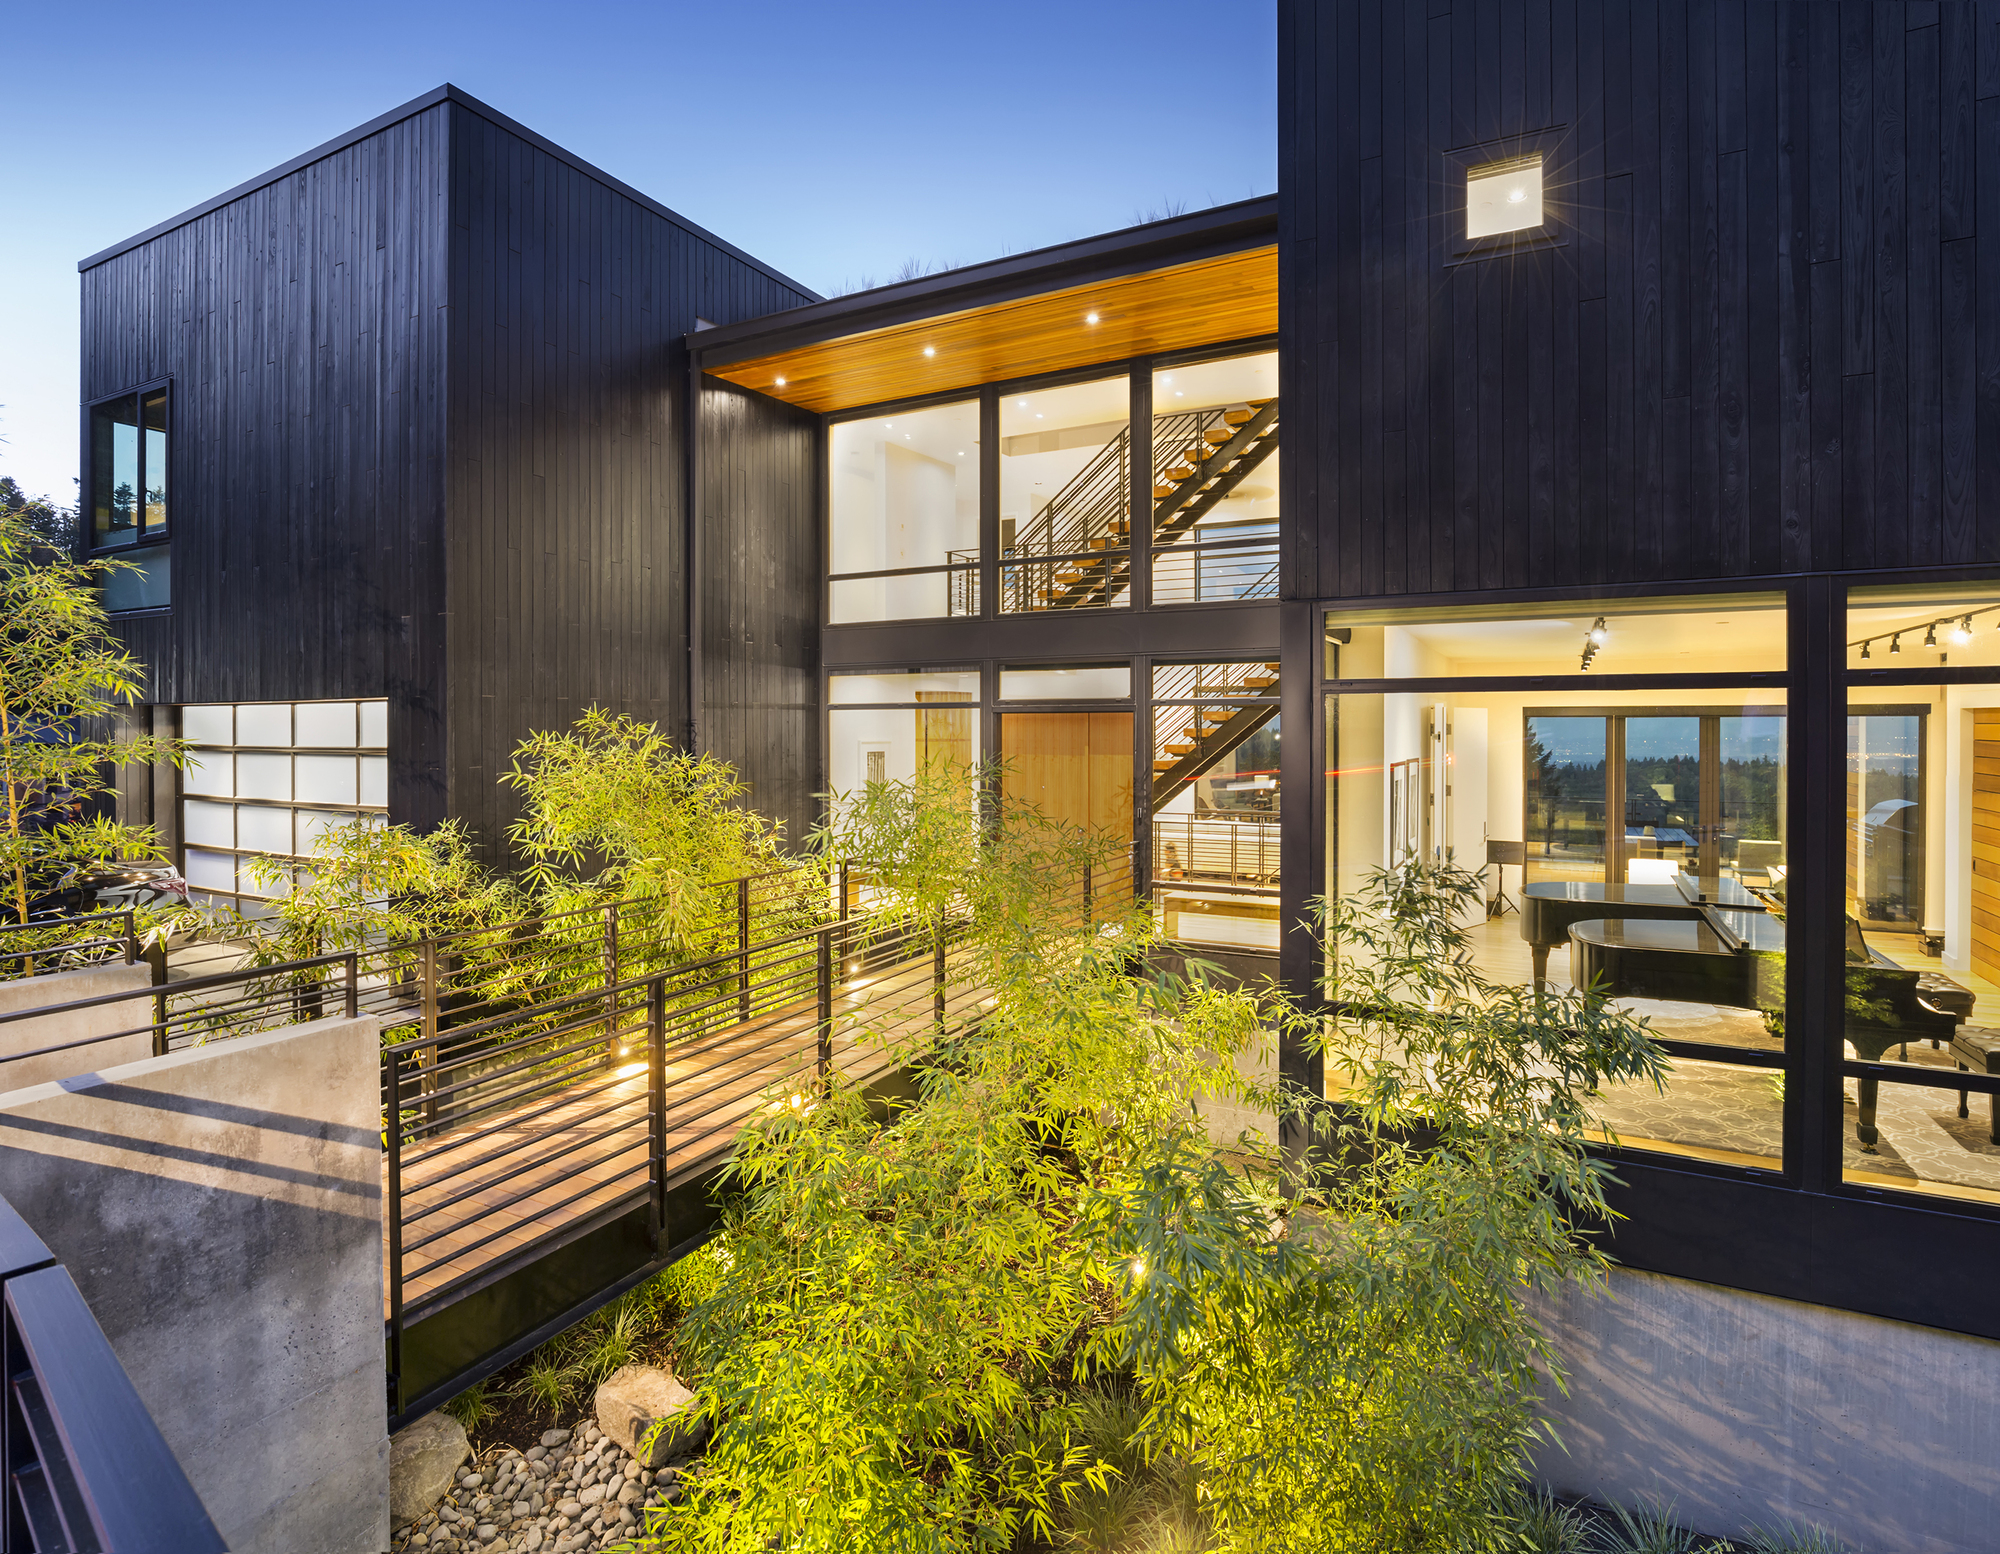 gallery of music box residence scott edwards. Black Bedroom Furniture Sets. Home Design Ideas